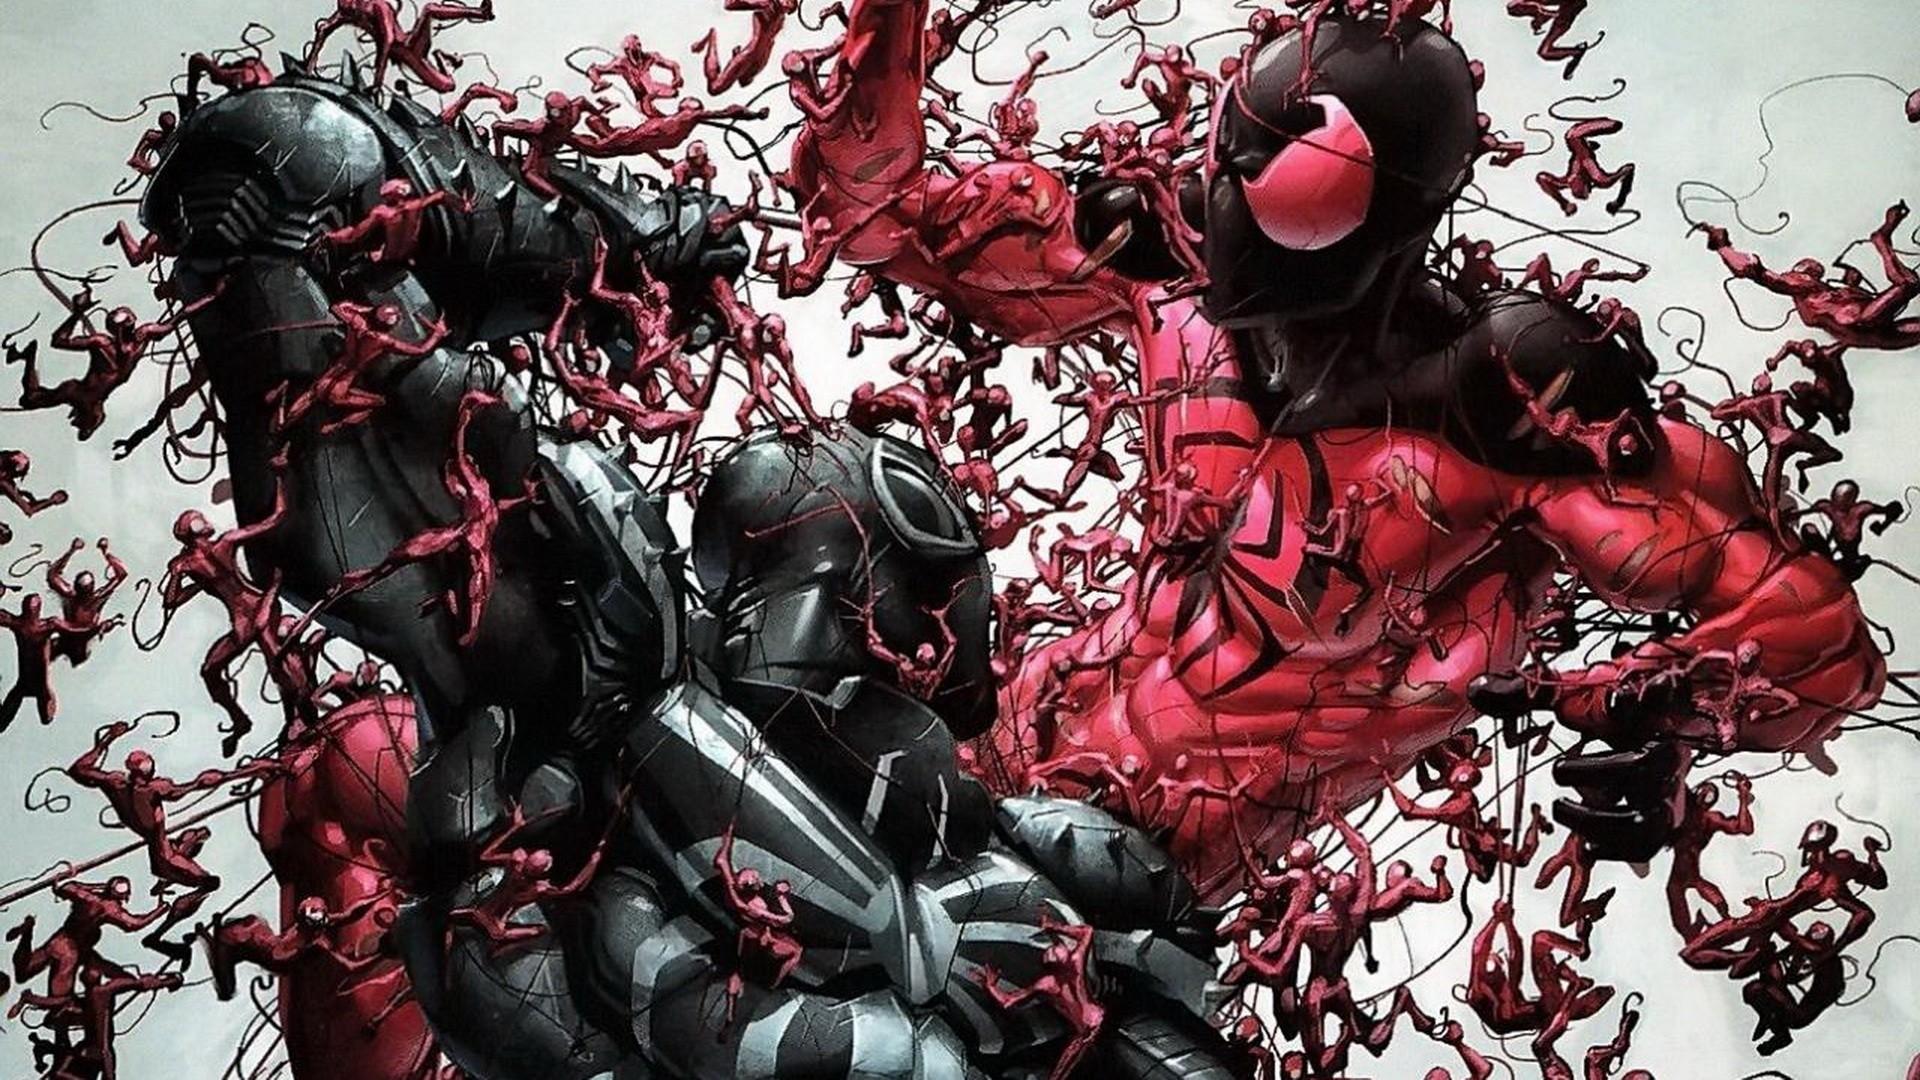 Cartoons, Marvel, Hero, Fighting, Spide Man, Simple Background wallpaper  thumb